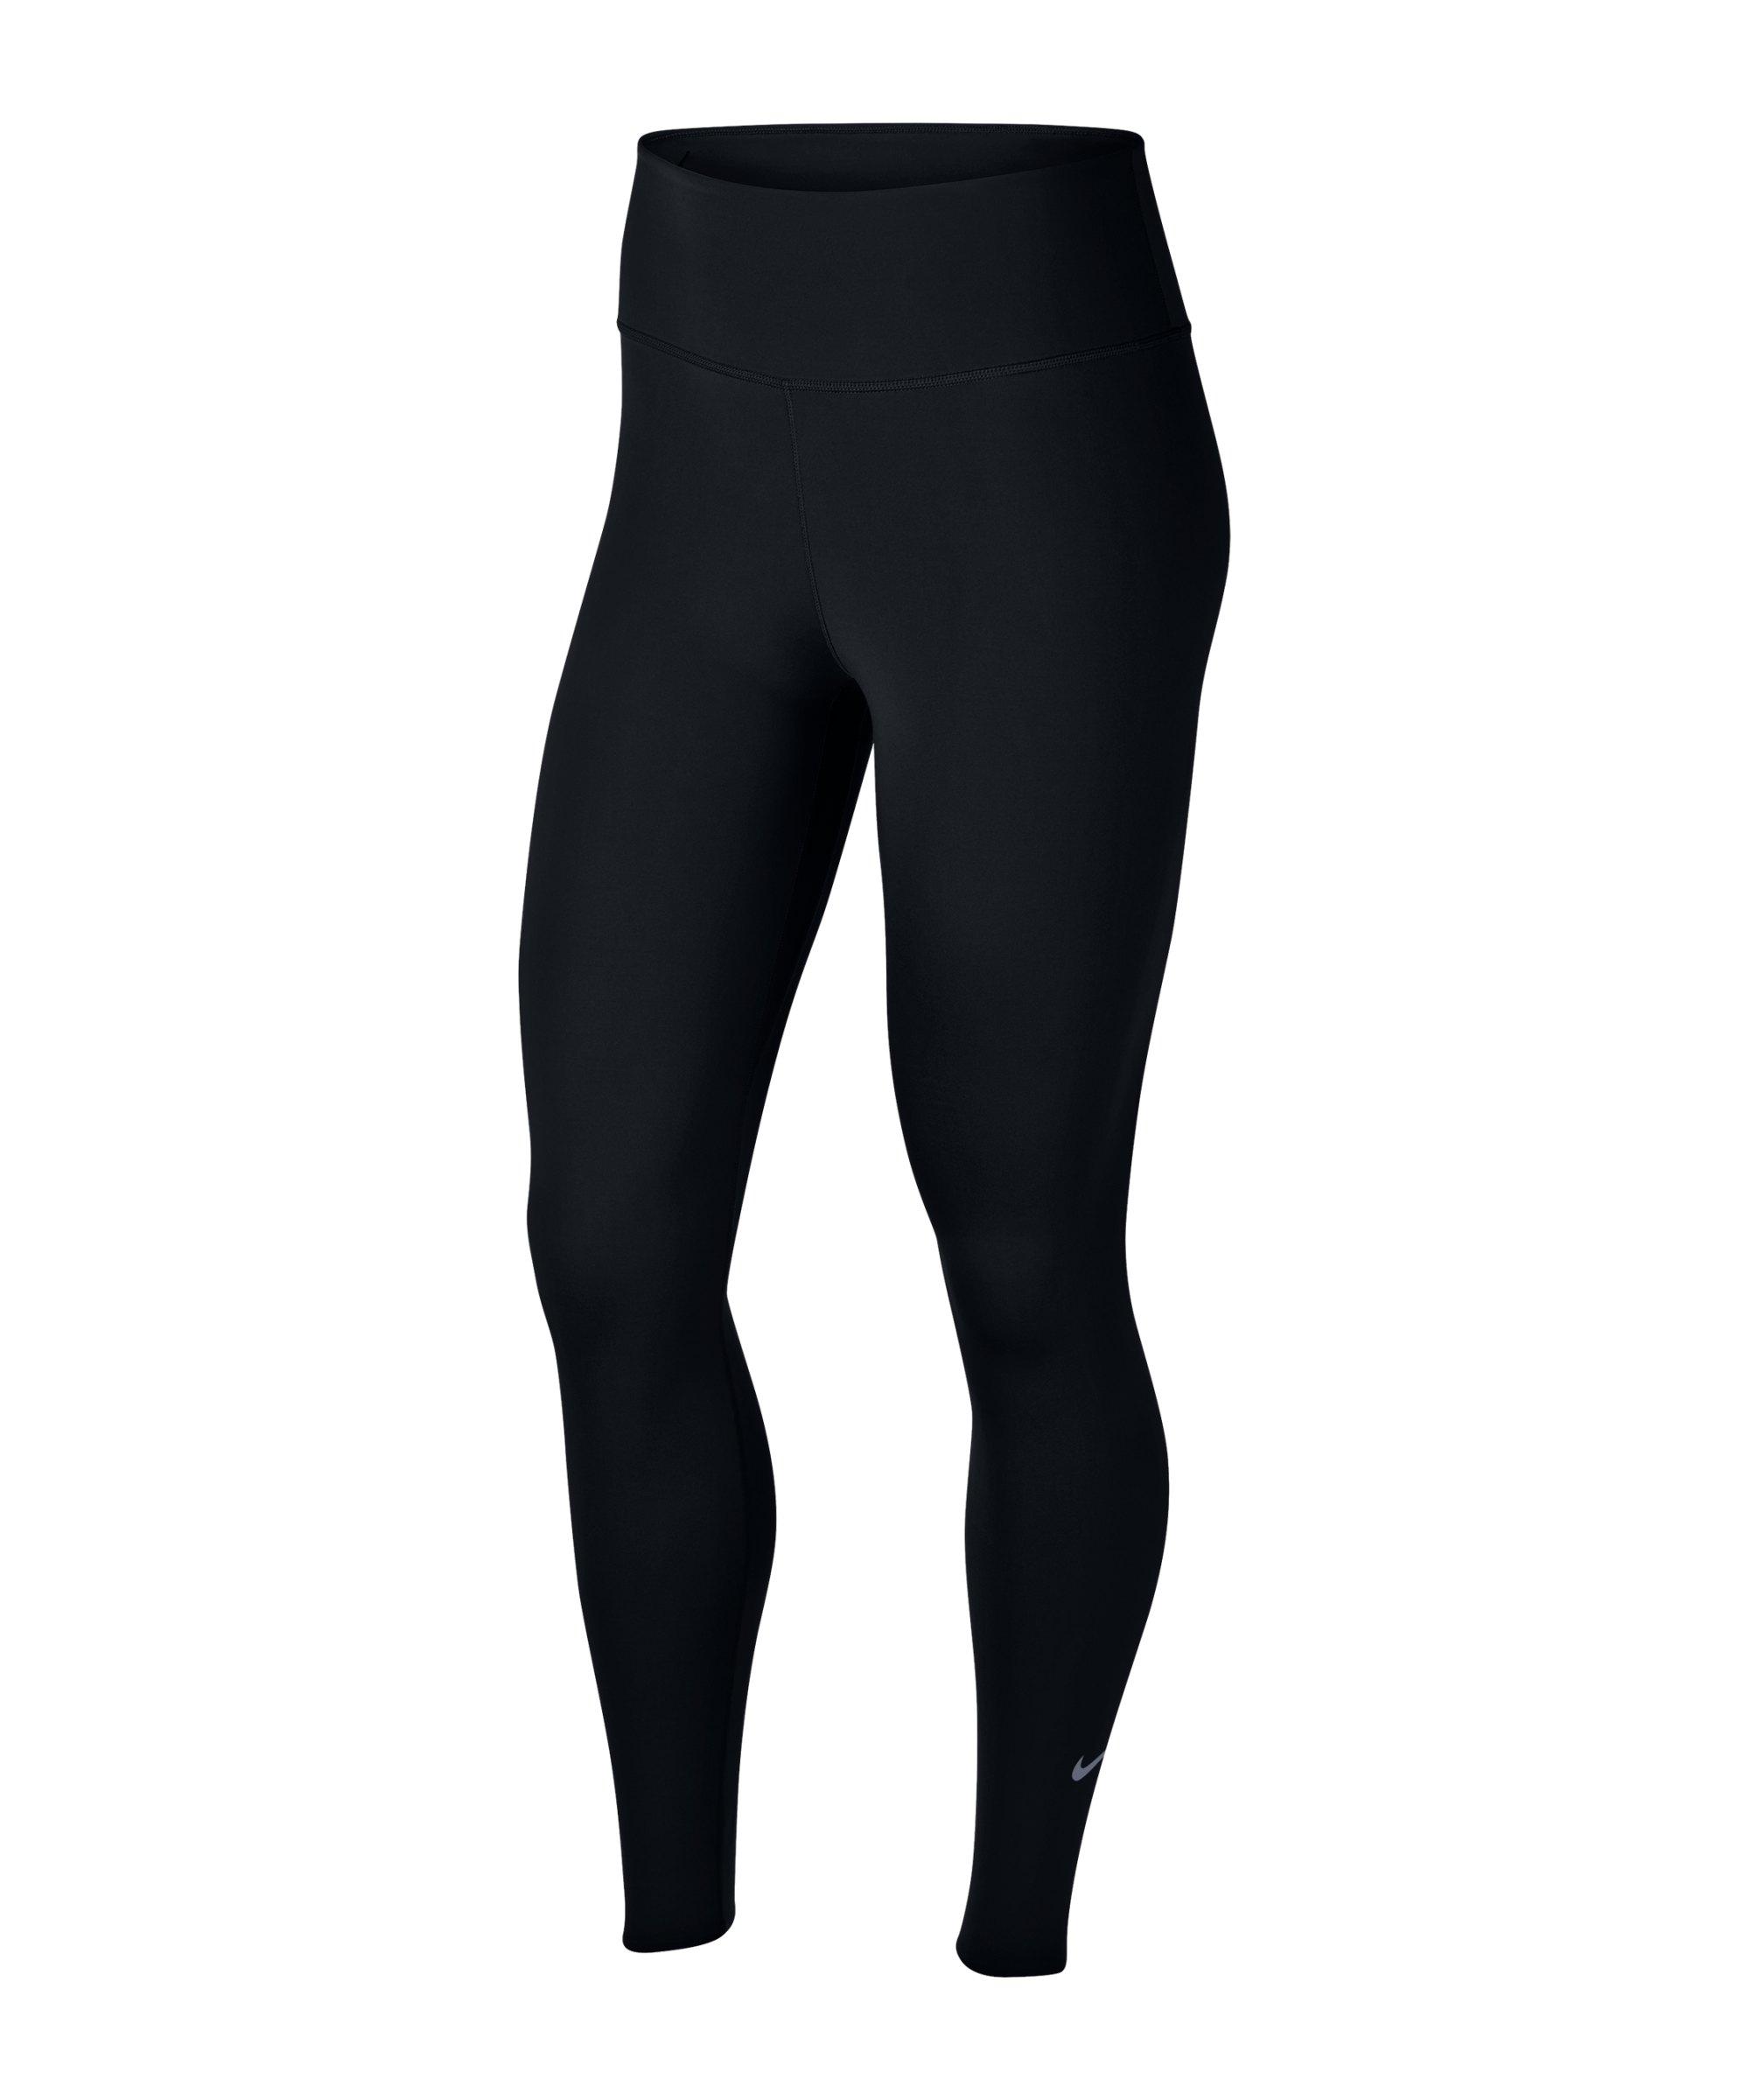 Nike One Luxe Leggings Running Damen Schwarz F010 - schwarz